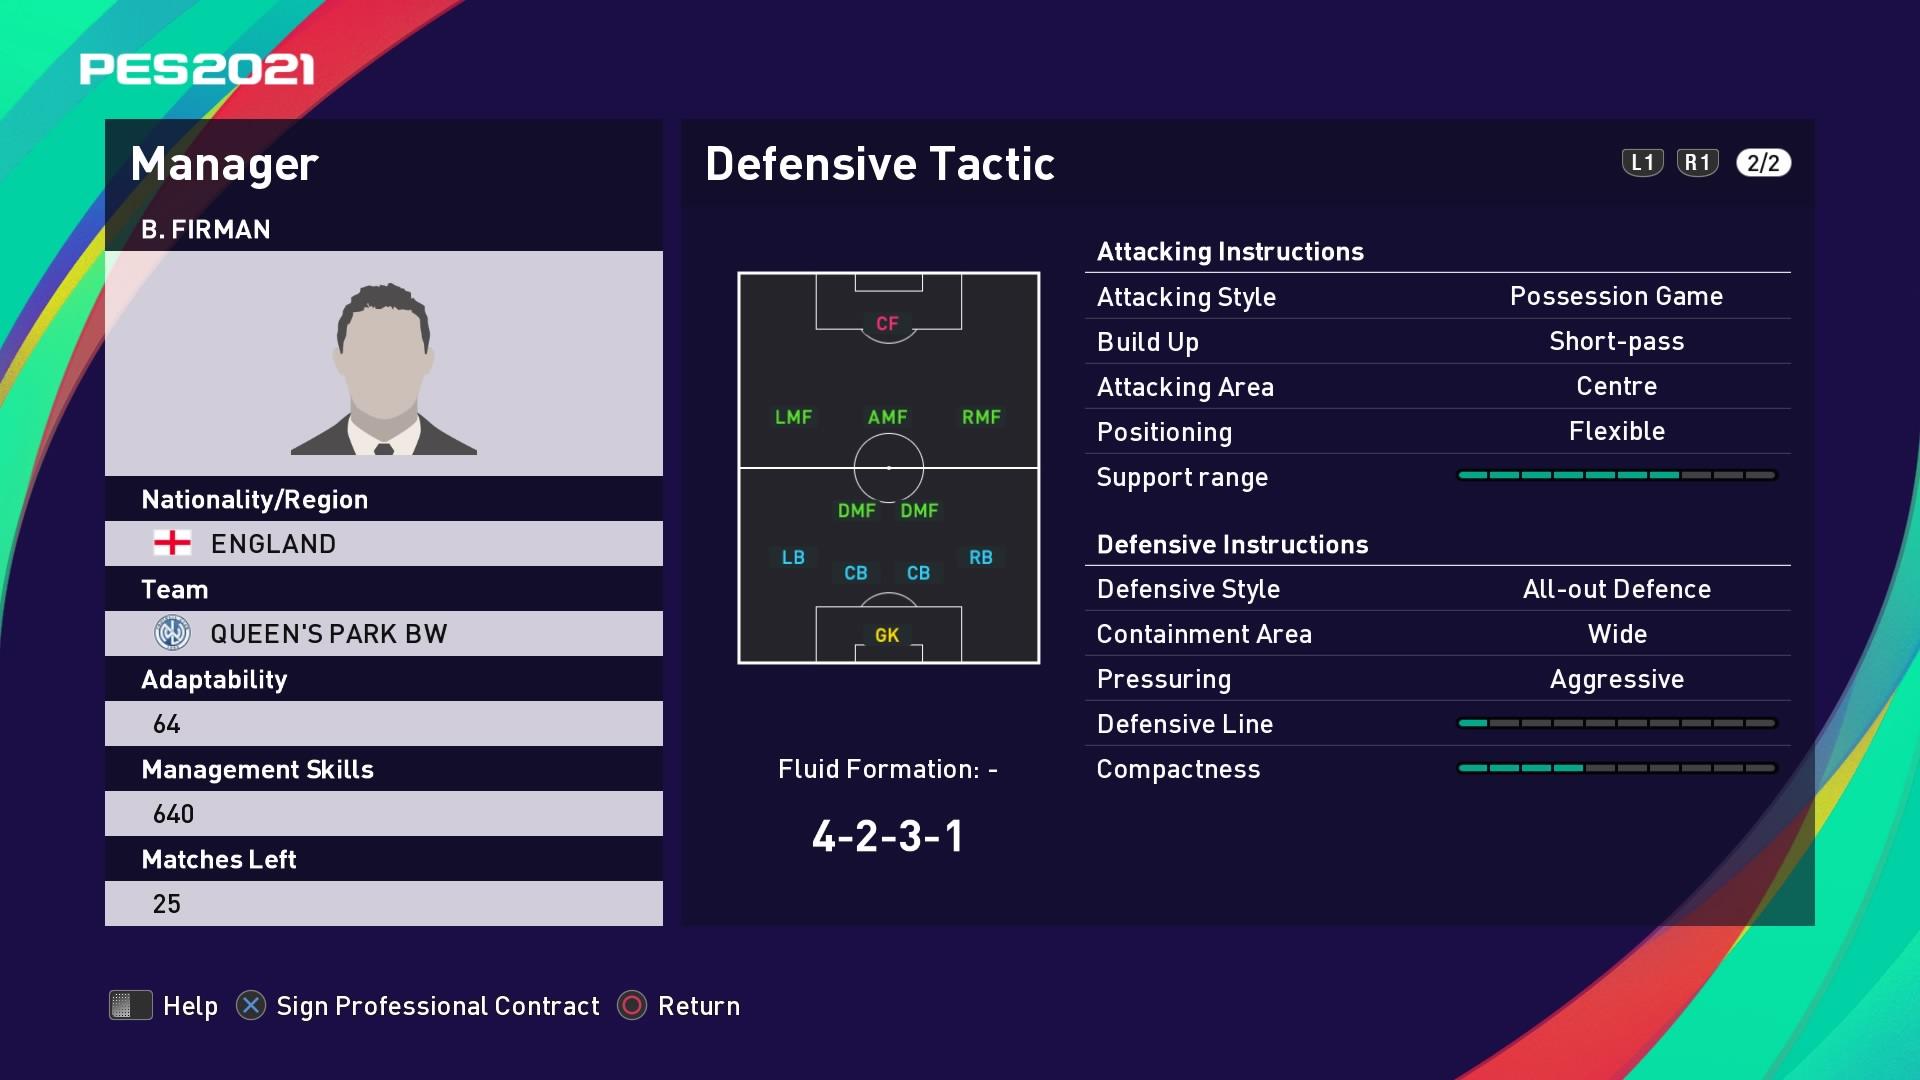 B. Firman (Mark Warburton) Defensive Tactic in PES 2021 myClub